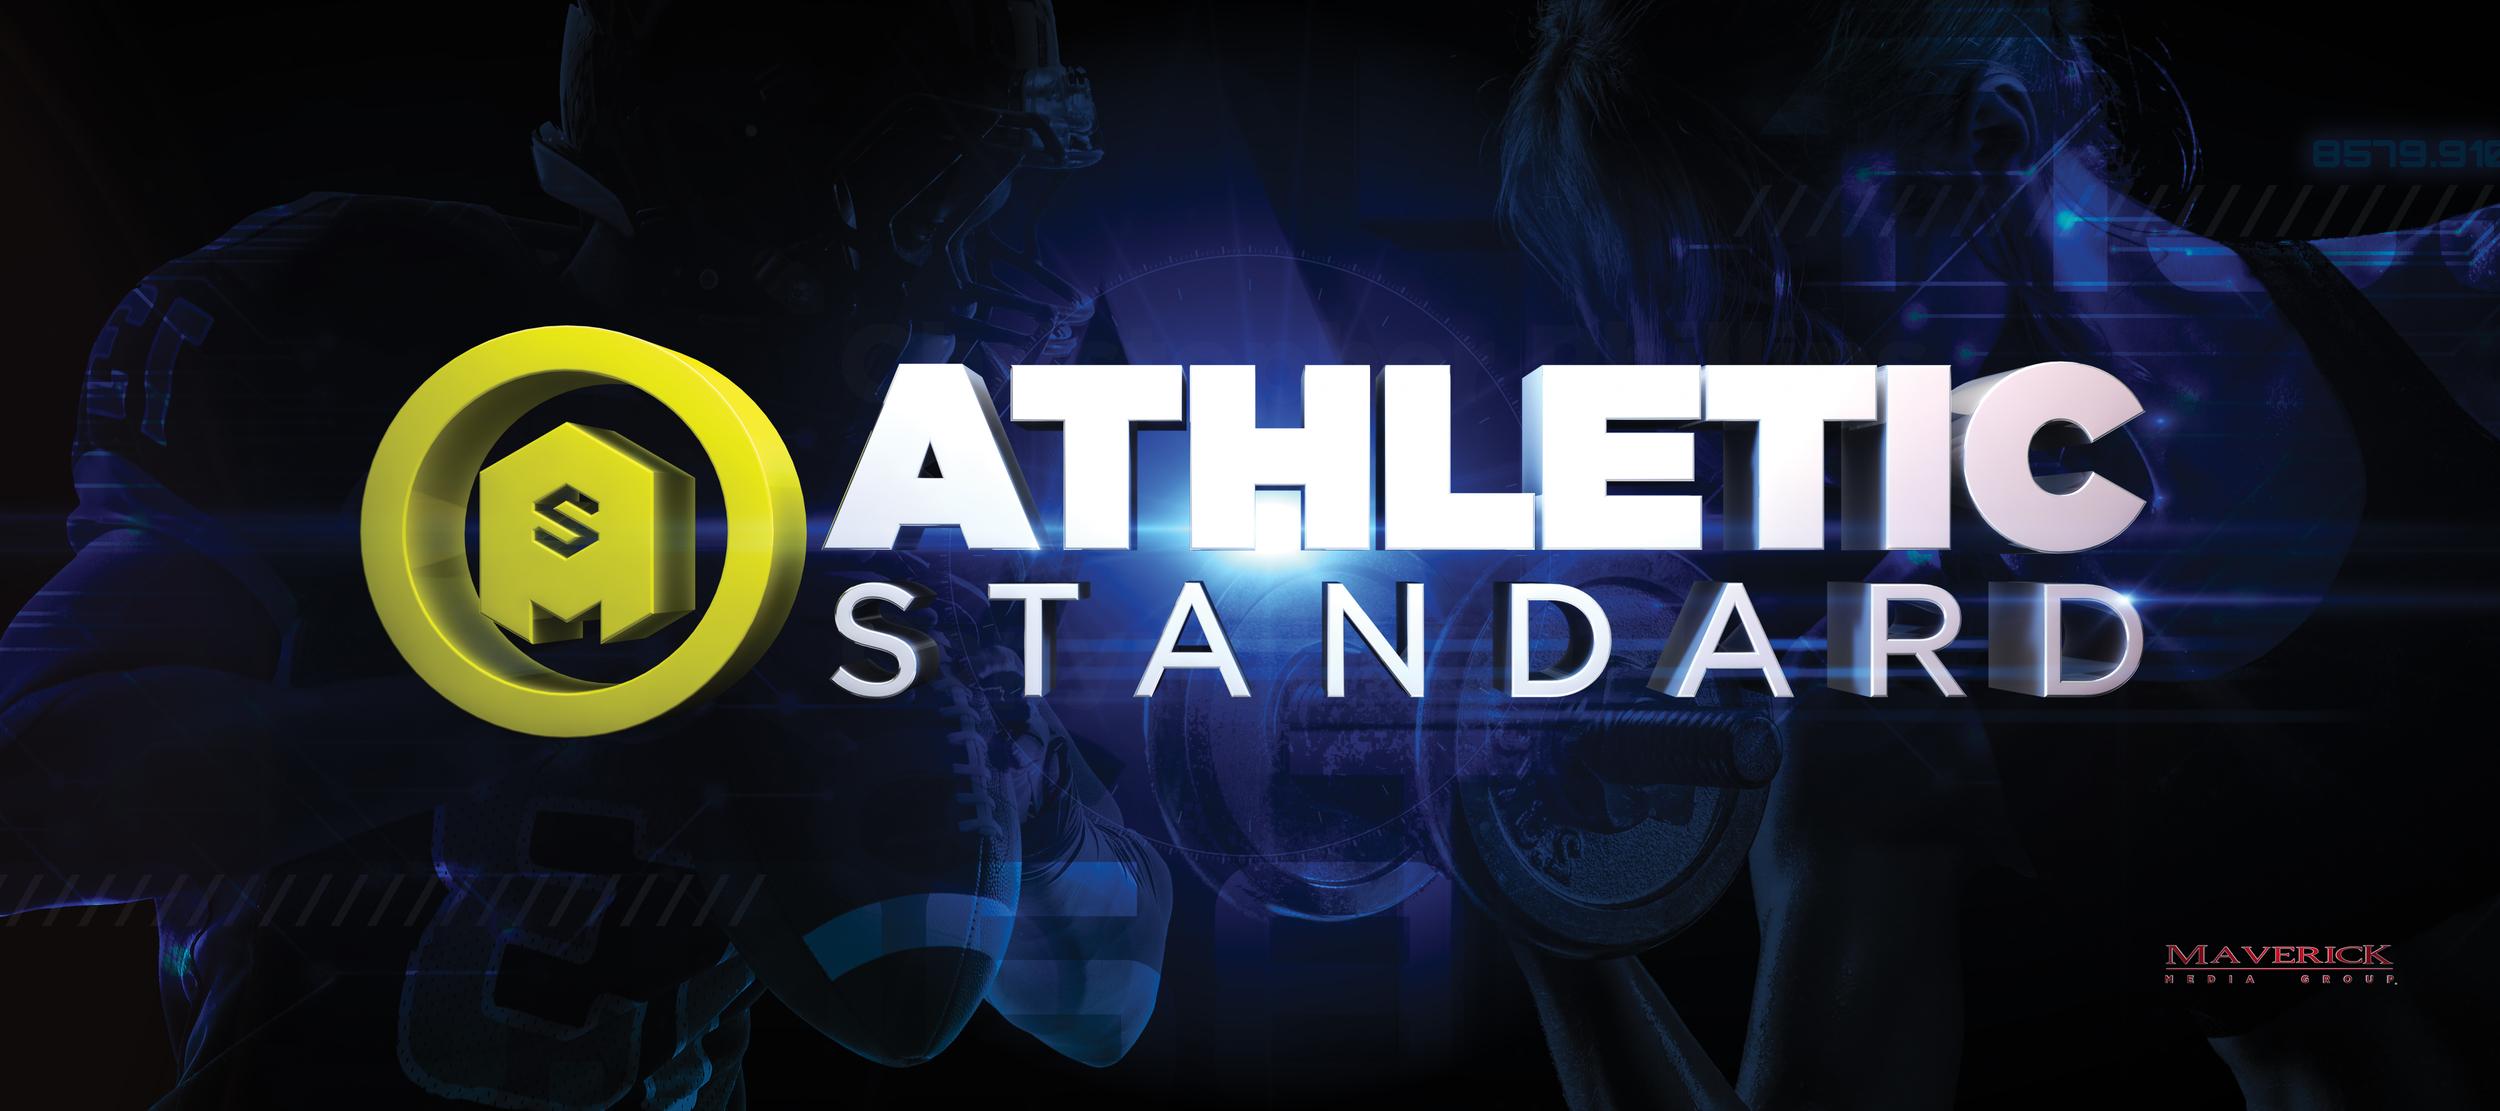 Athletic-Standard-Front-Cloth_RGB_00000.jpg